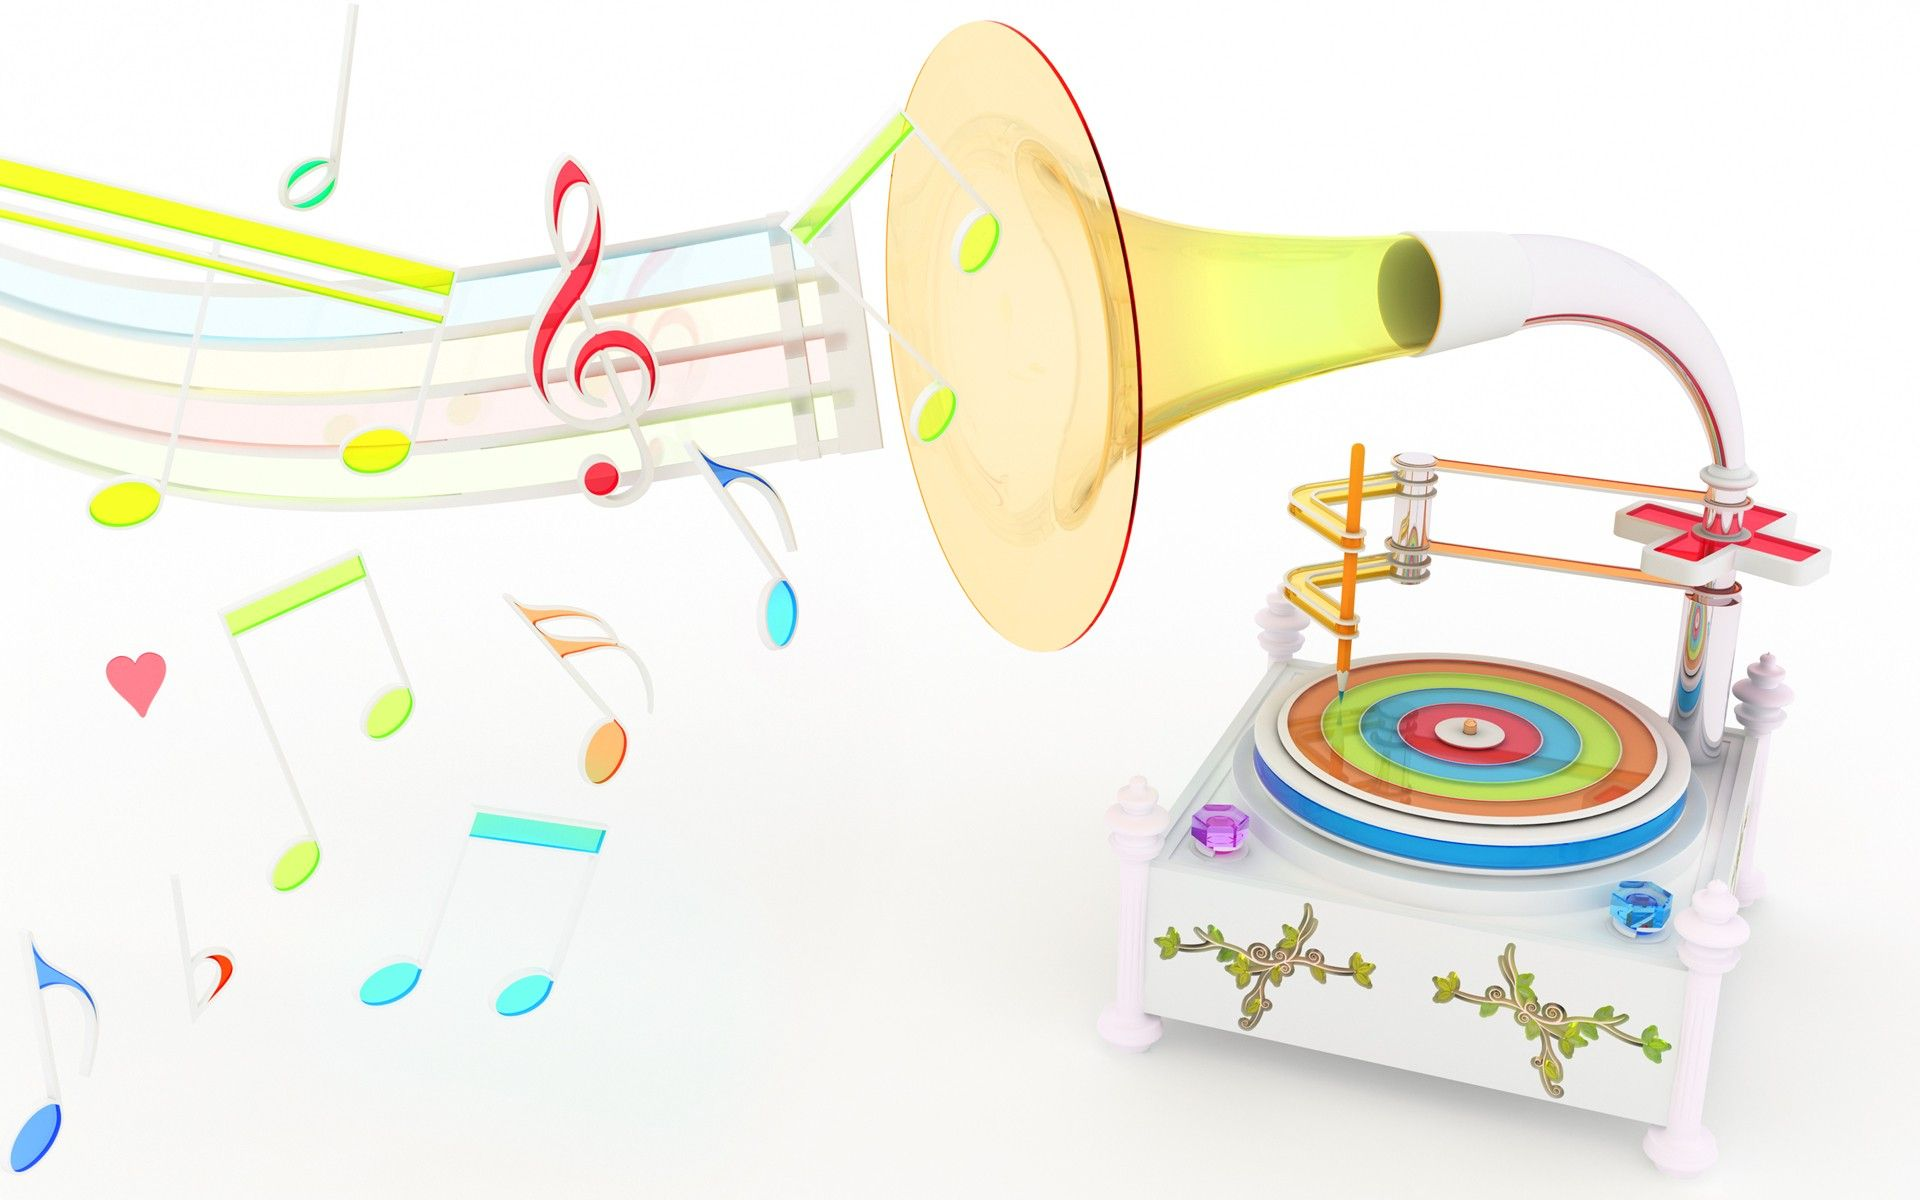 8589130490590 Rainbow Music Notes Wallpaper Hd Jpg: Neon Music Notes Background Neon Trumpet Artwork Wallpaper